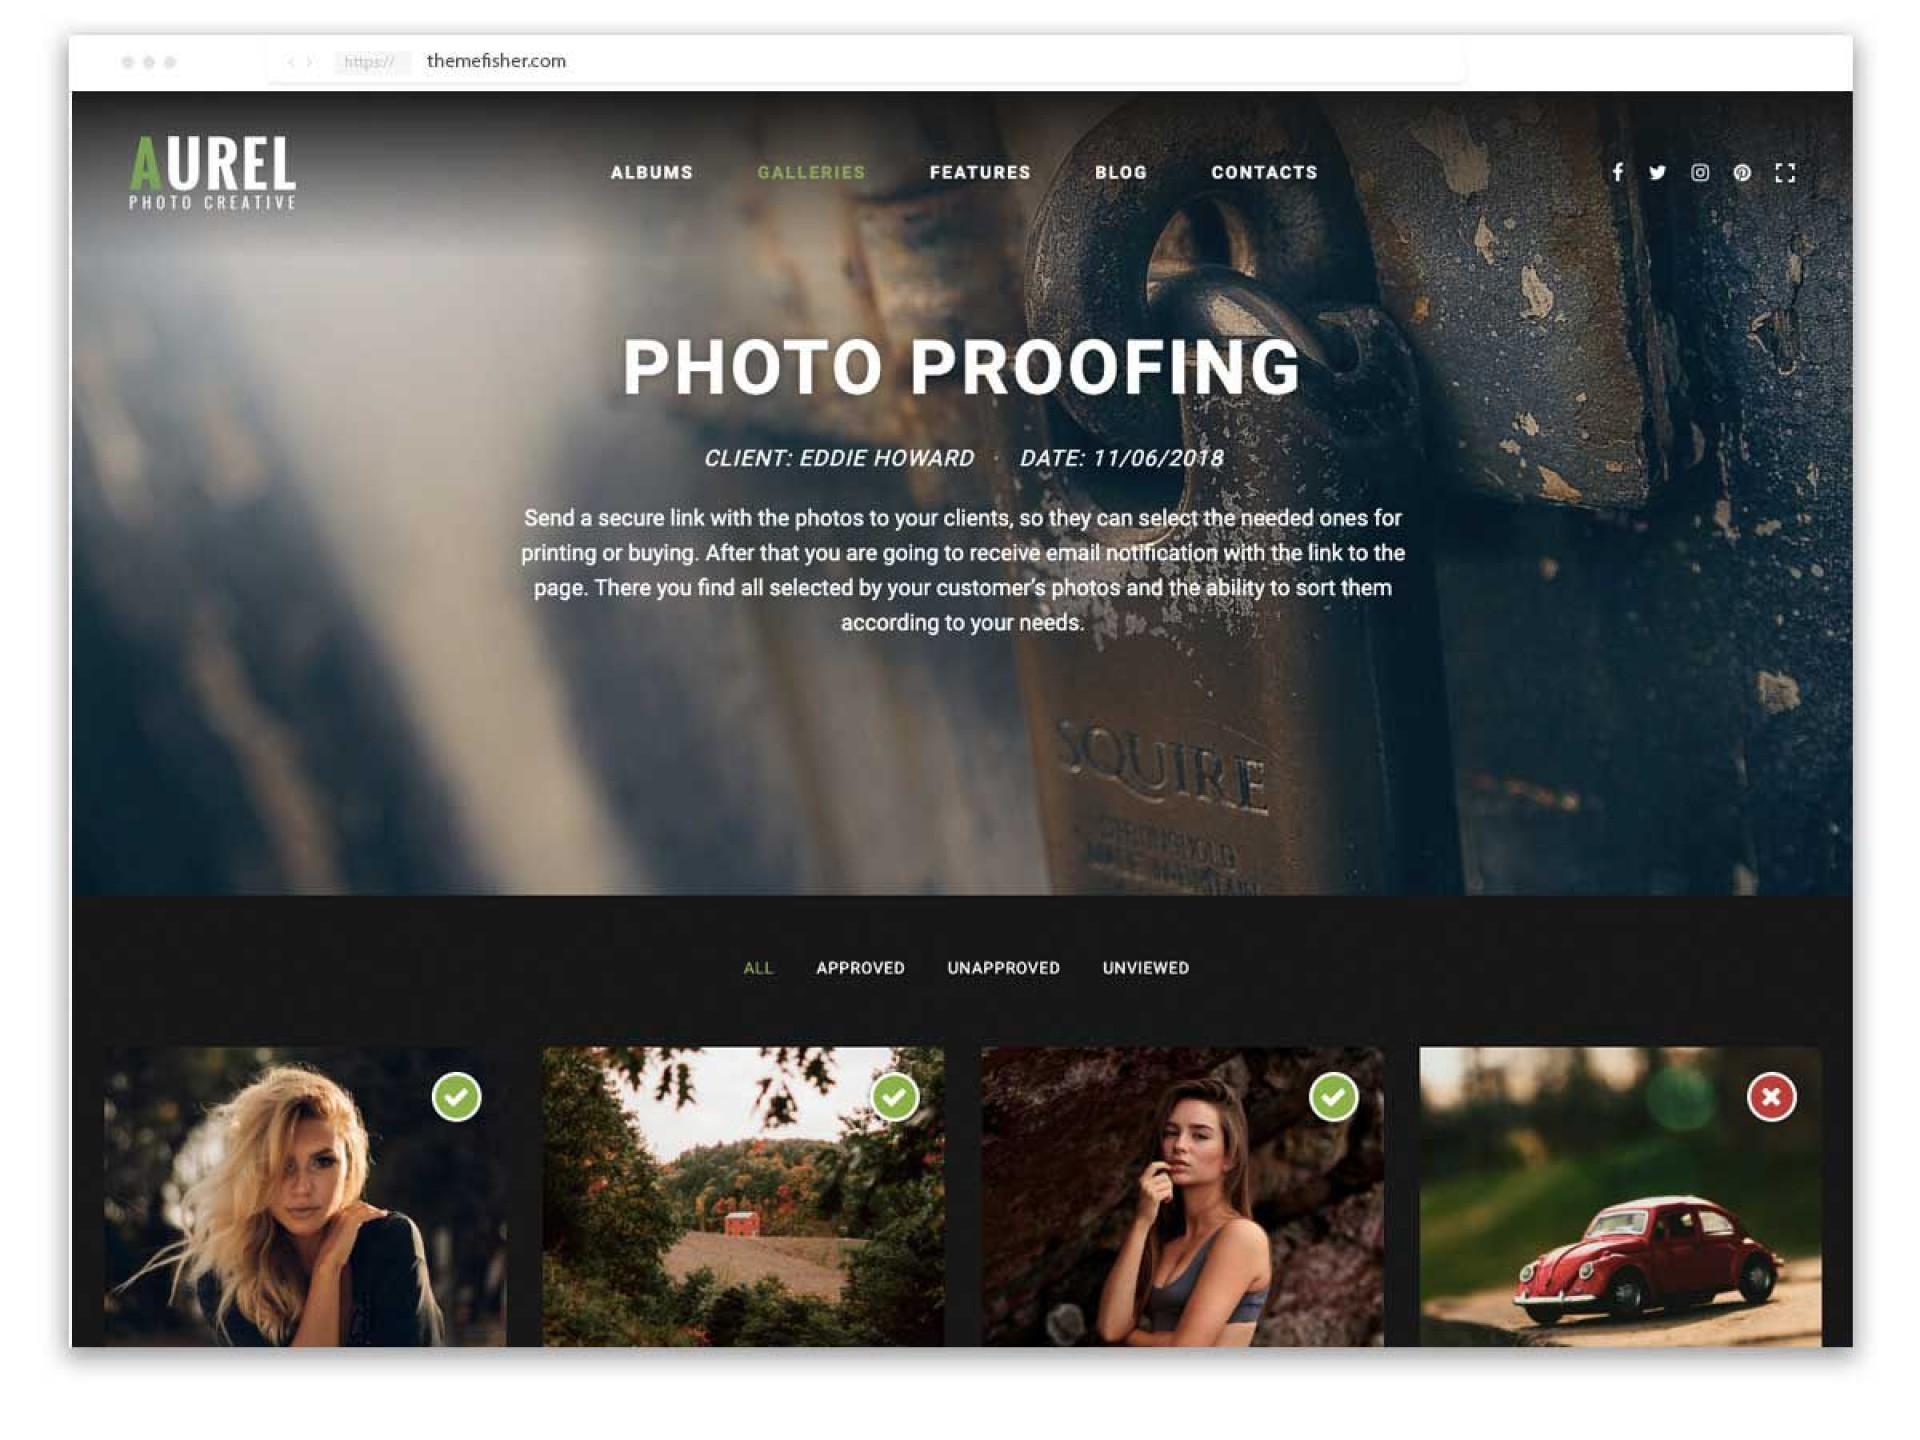 001 Unbelievable Website Template For Photographer Photo  Photographers Free Responsive Photography Php Best1920